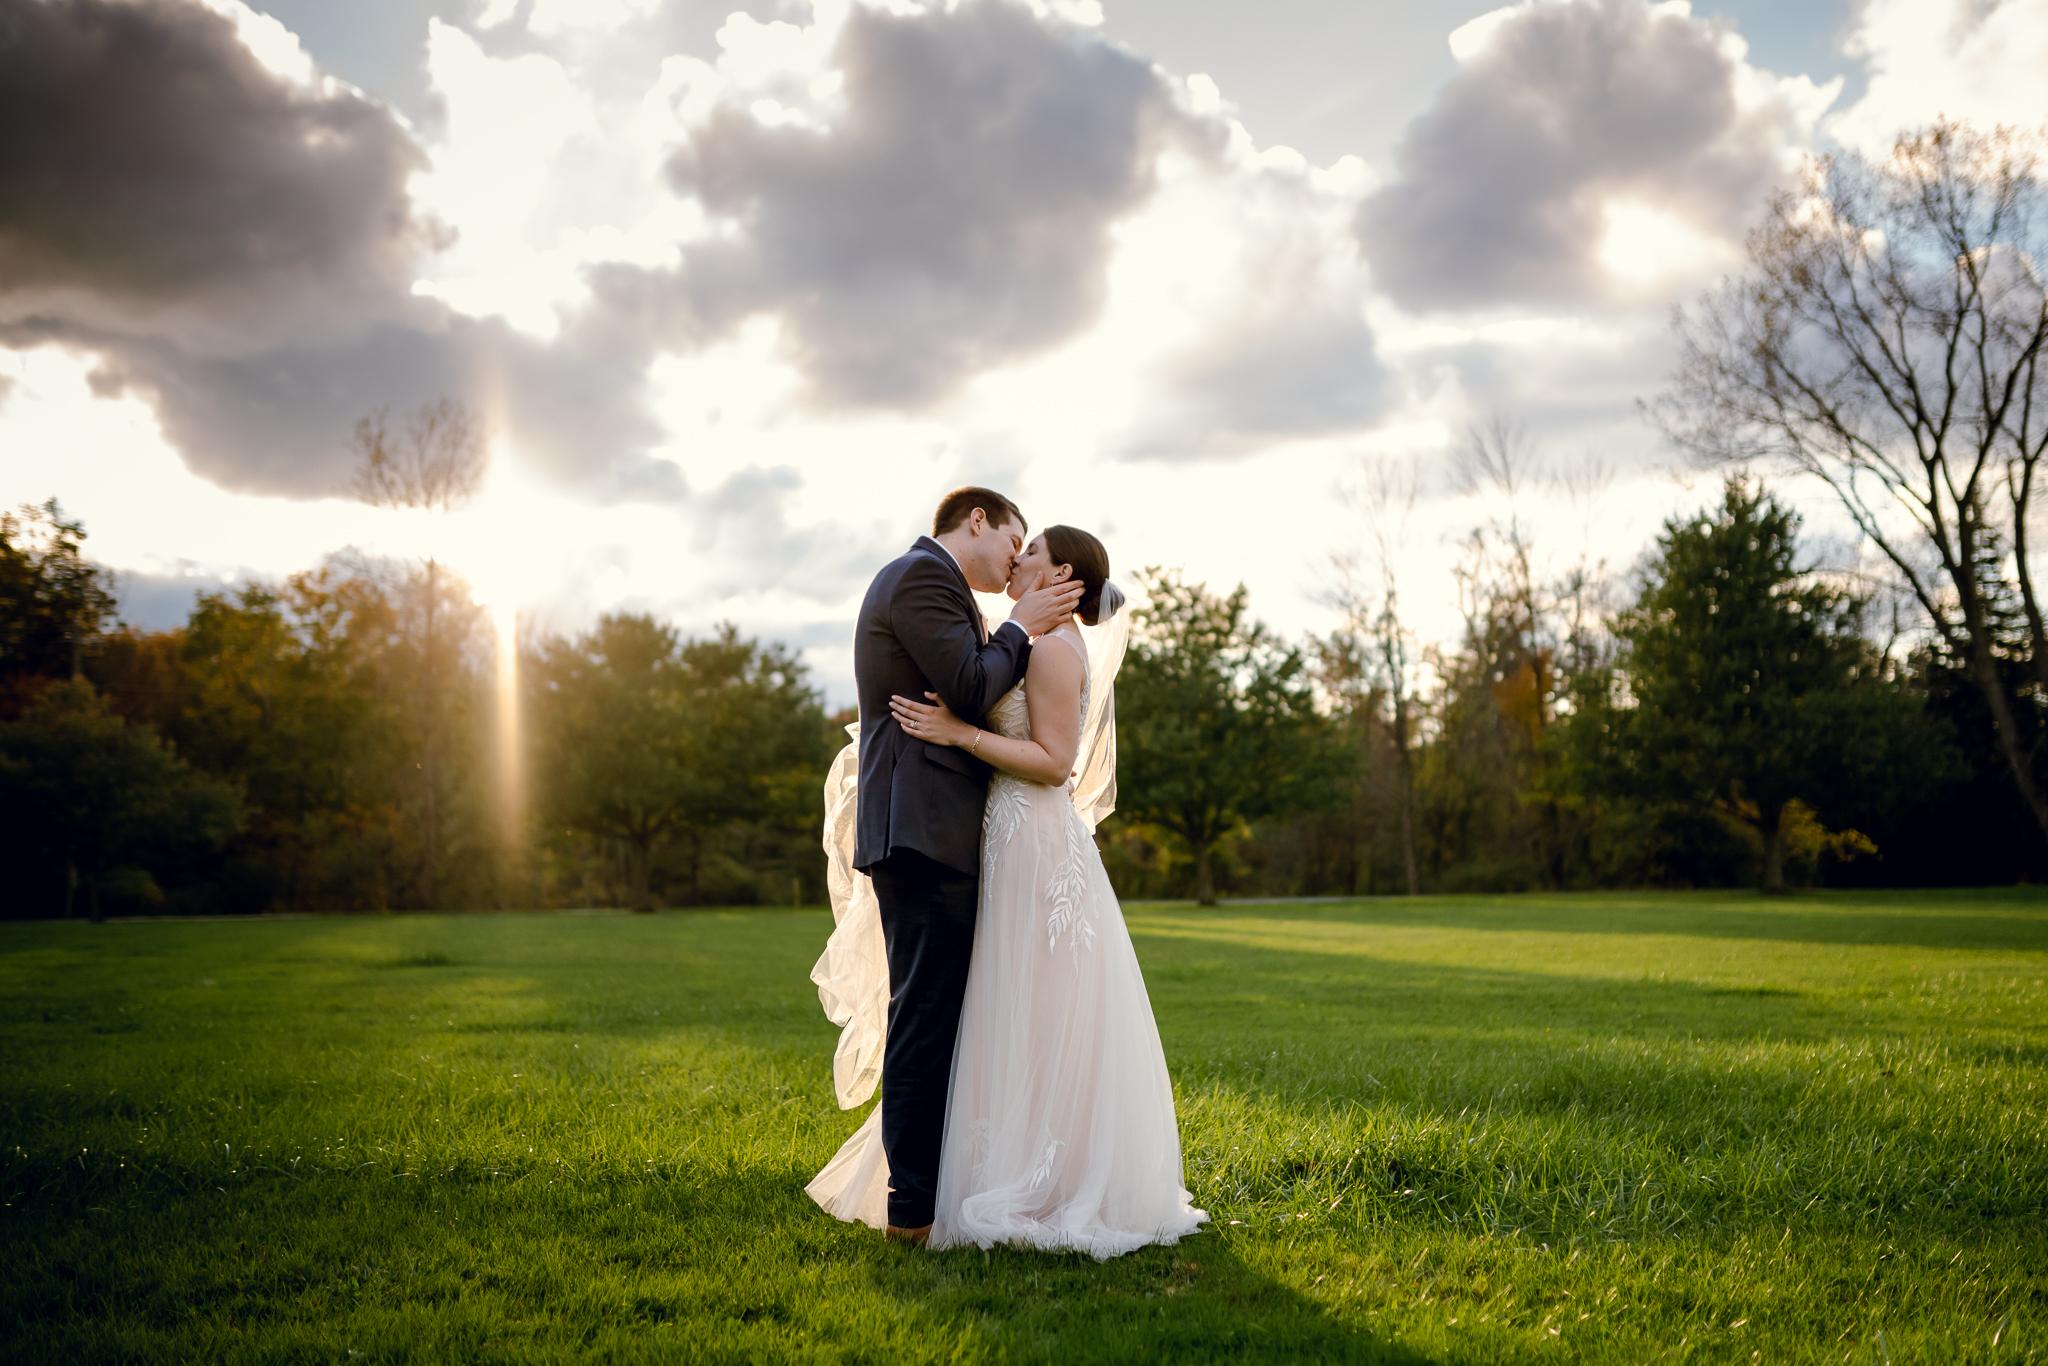 Klocs Grove West Seneca NY Wedding Photograph by Becca Sutherland Wedding Photographer